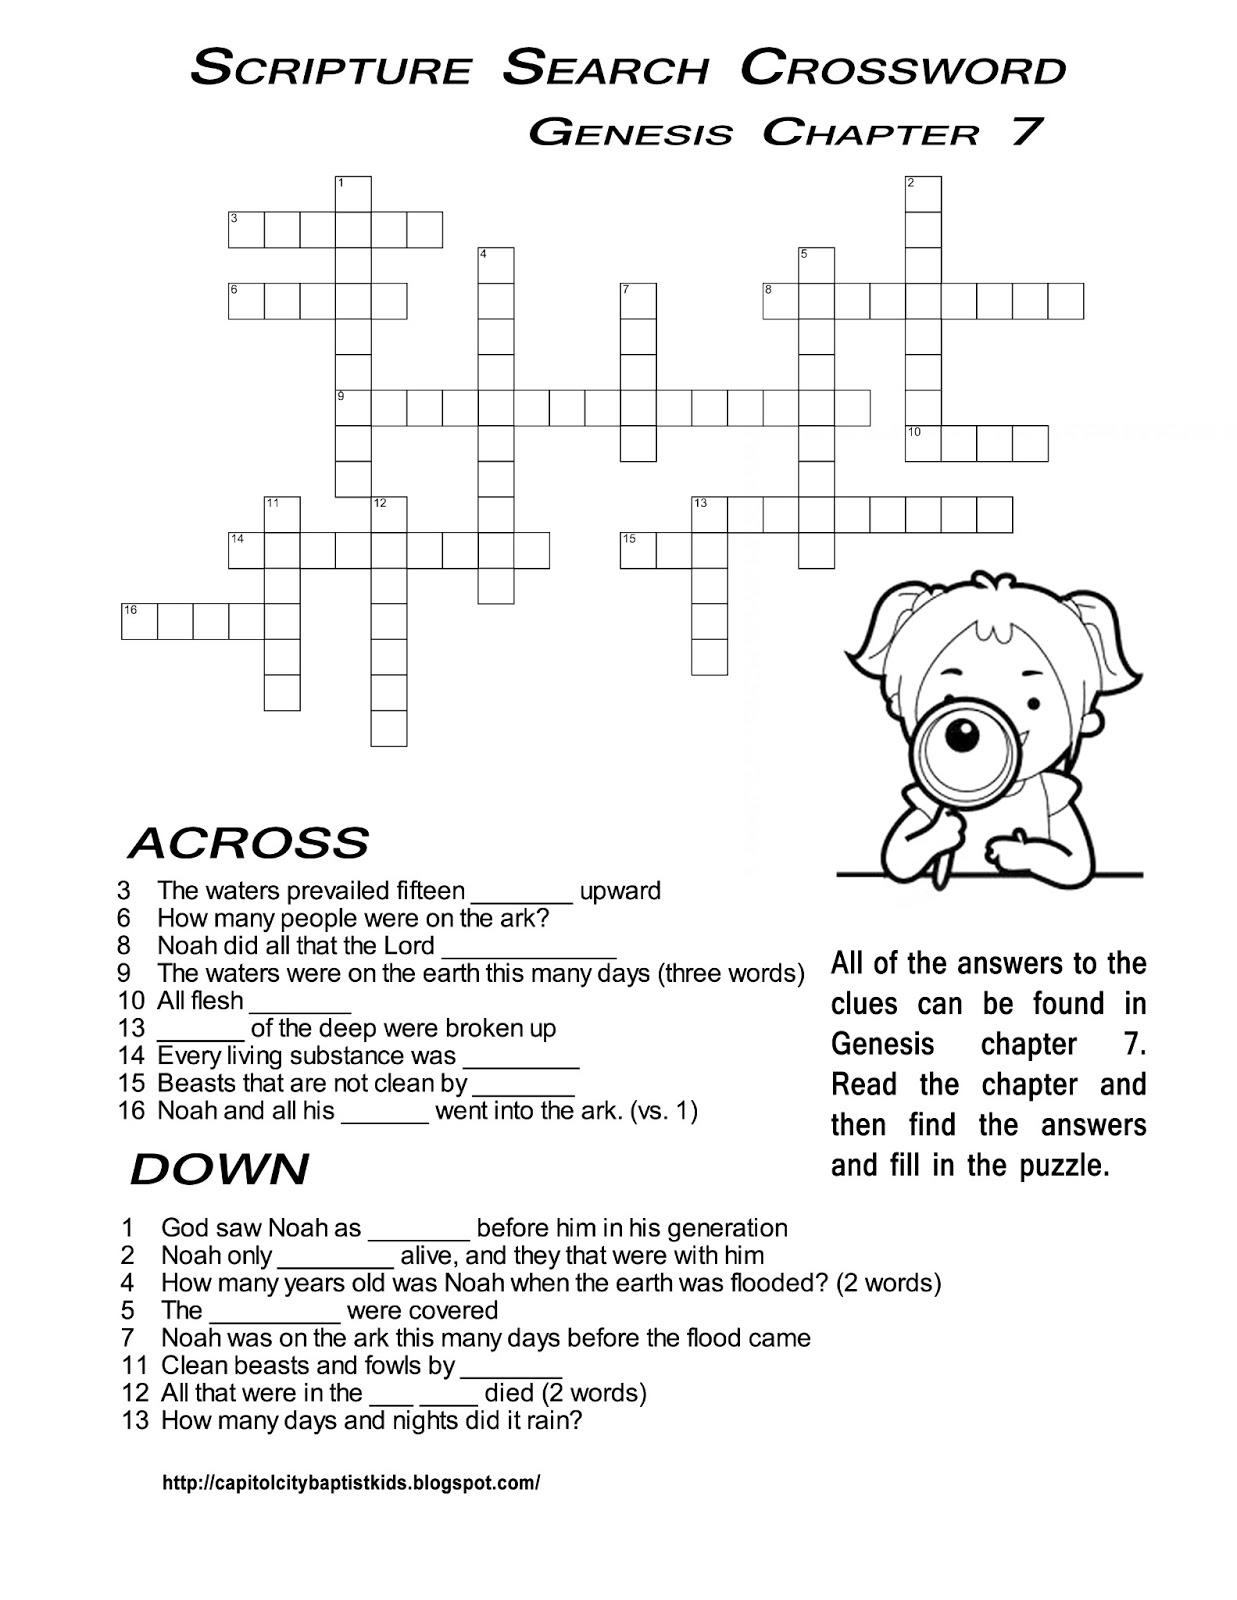 Ccbc Kids Corner: Scripture Search Crossword #2 - February Crossword Puzzle Printable